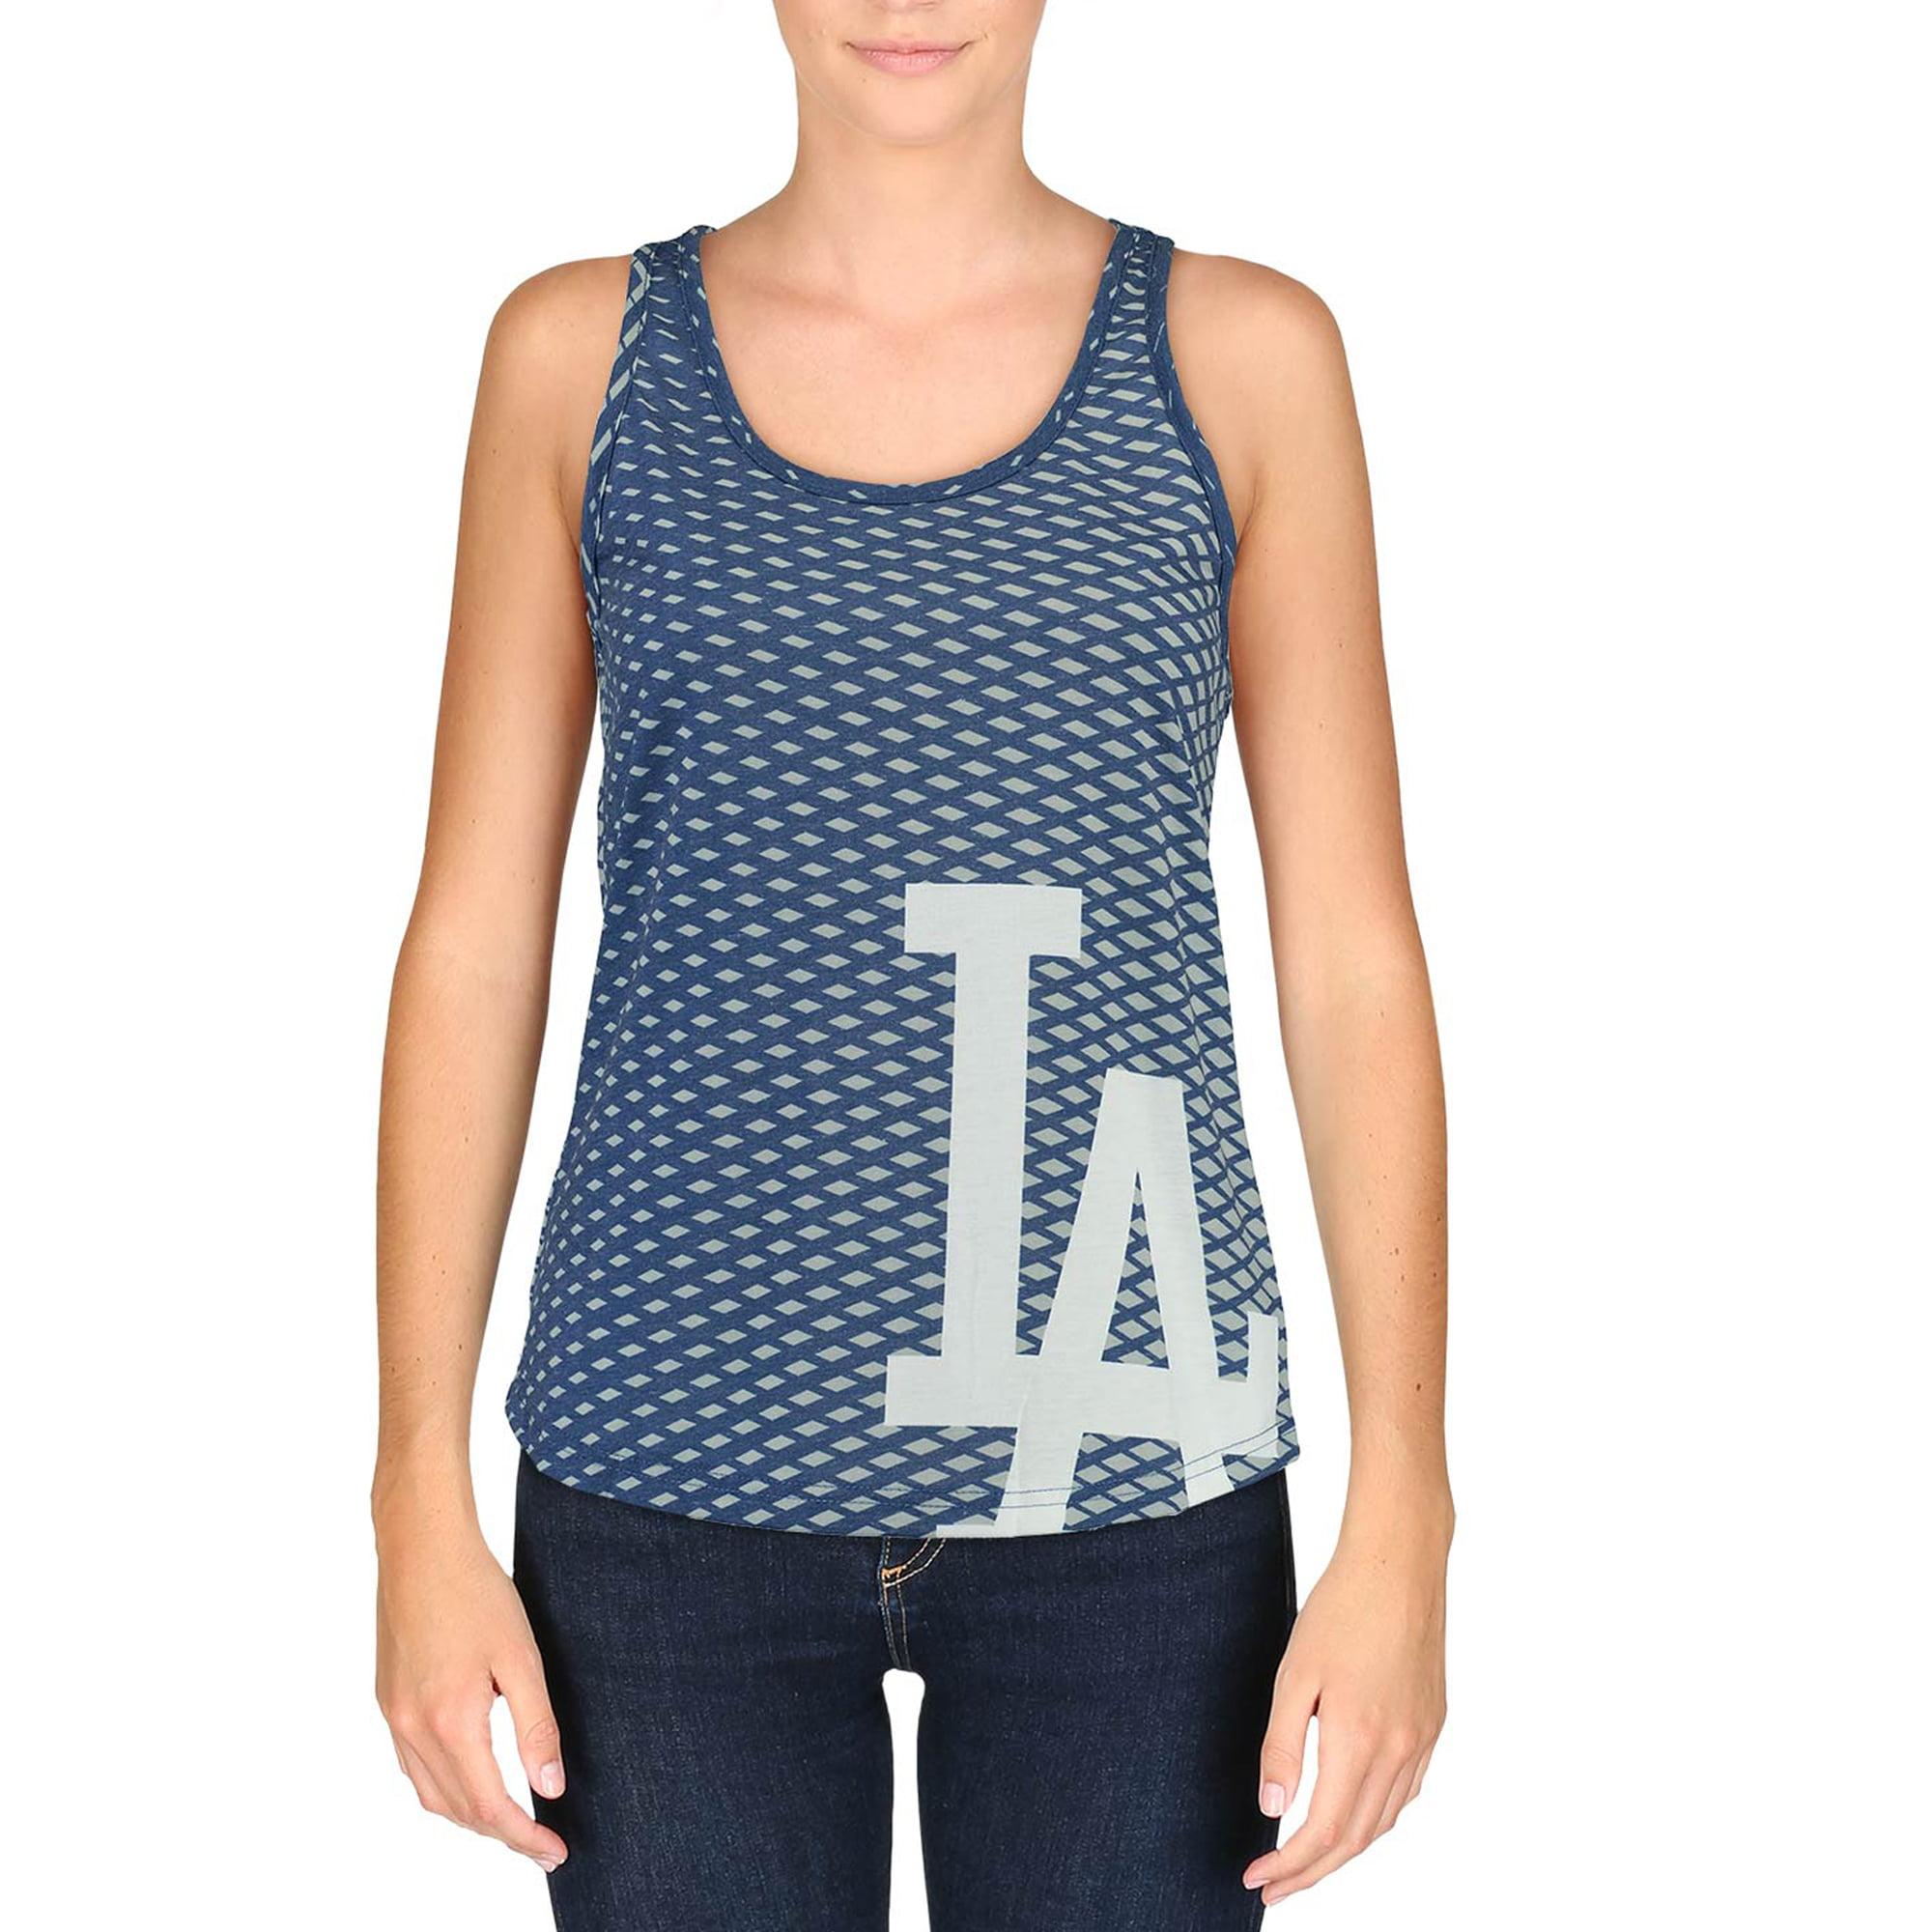 Los Angeles Dodgers Women's Diamond Racerback Tank Top - Royal